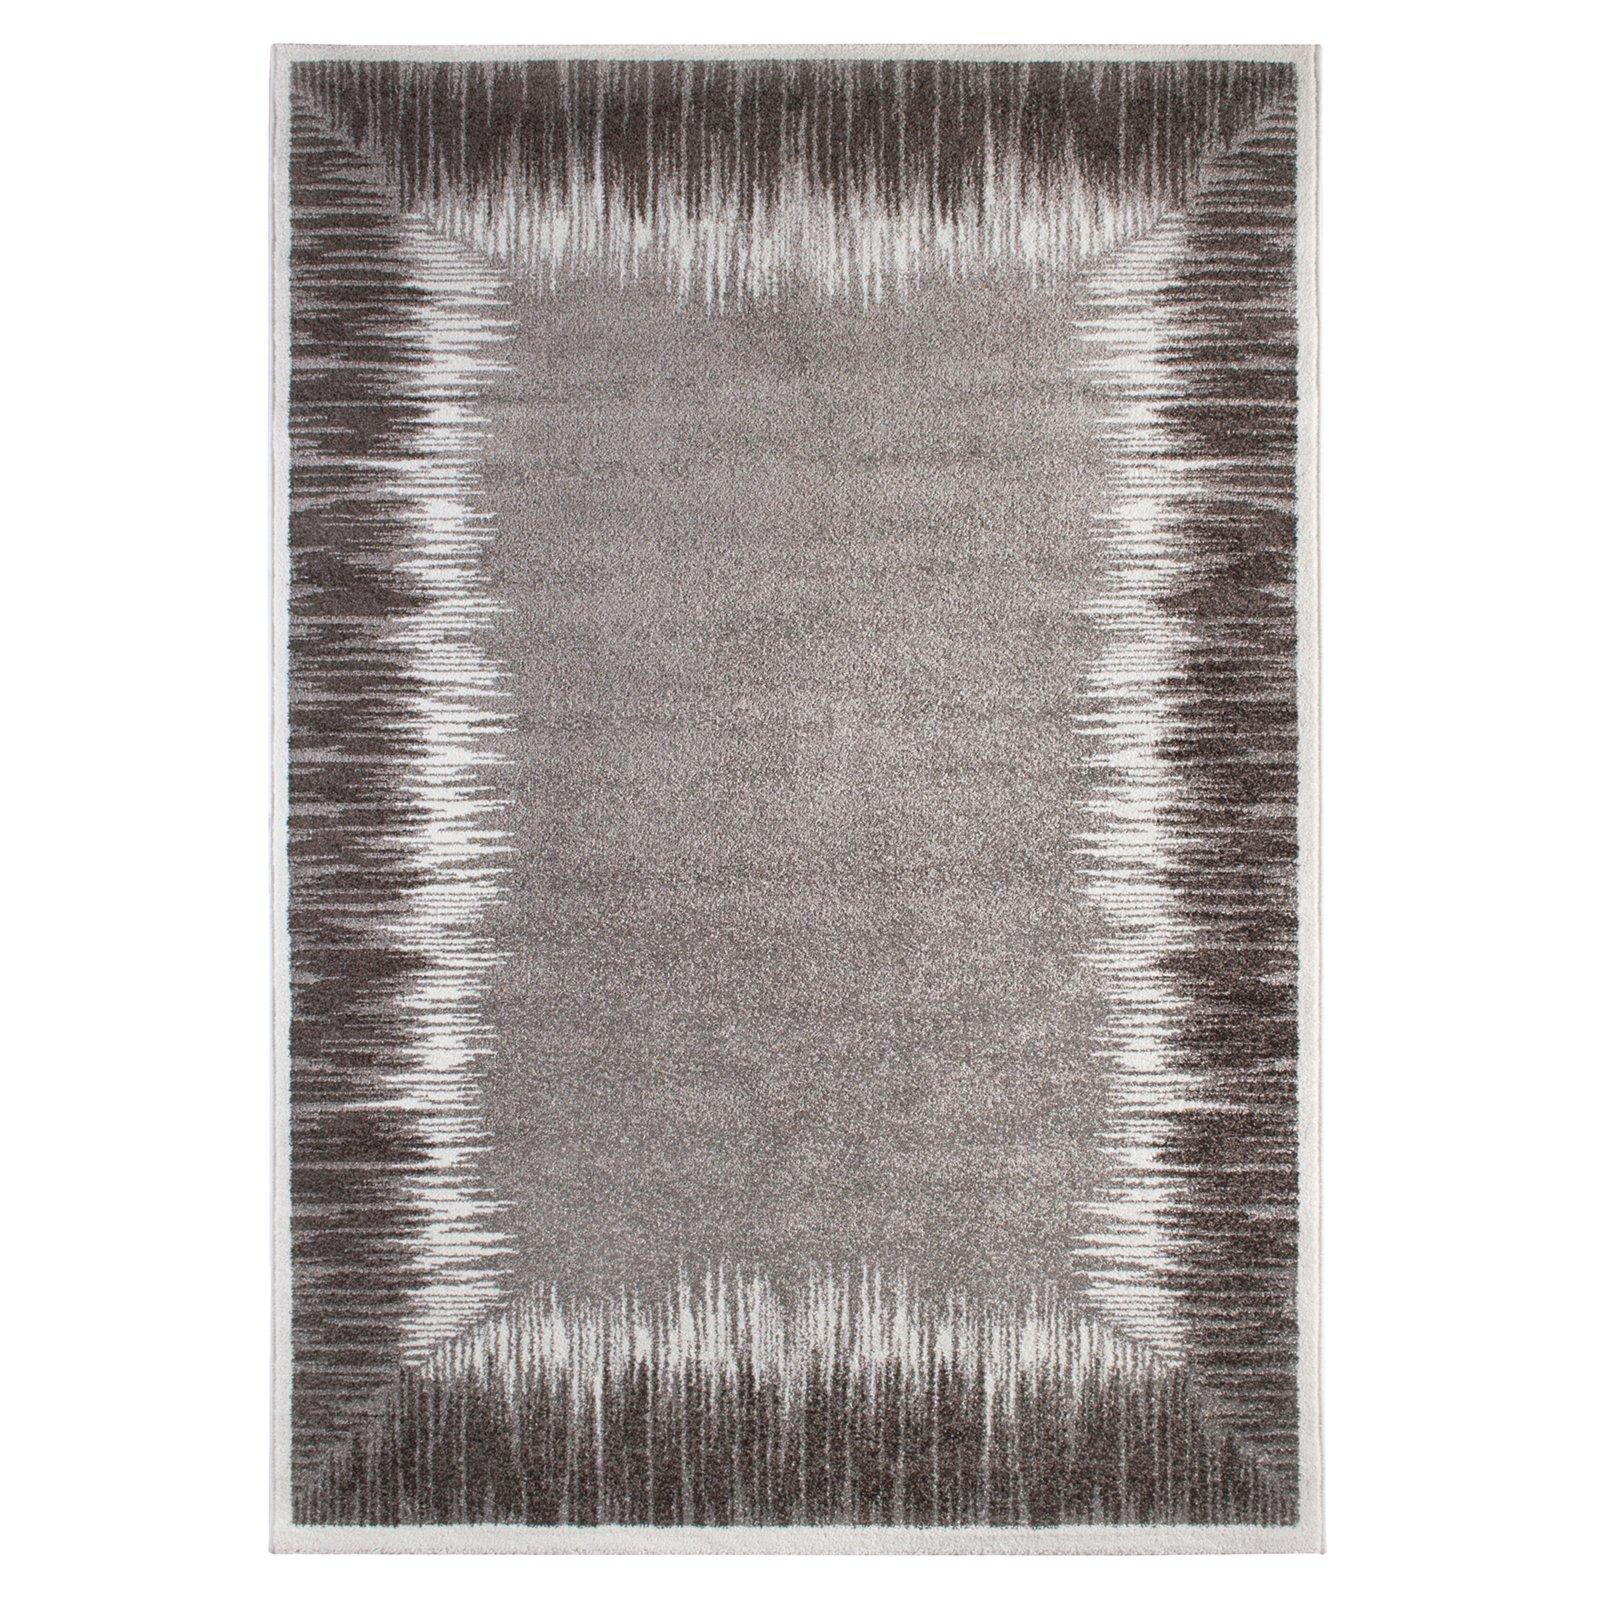 teppich grau 160x230 cm gemusterte teppiche. Black Bedroom Furniture Sets. Home Design Ideas